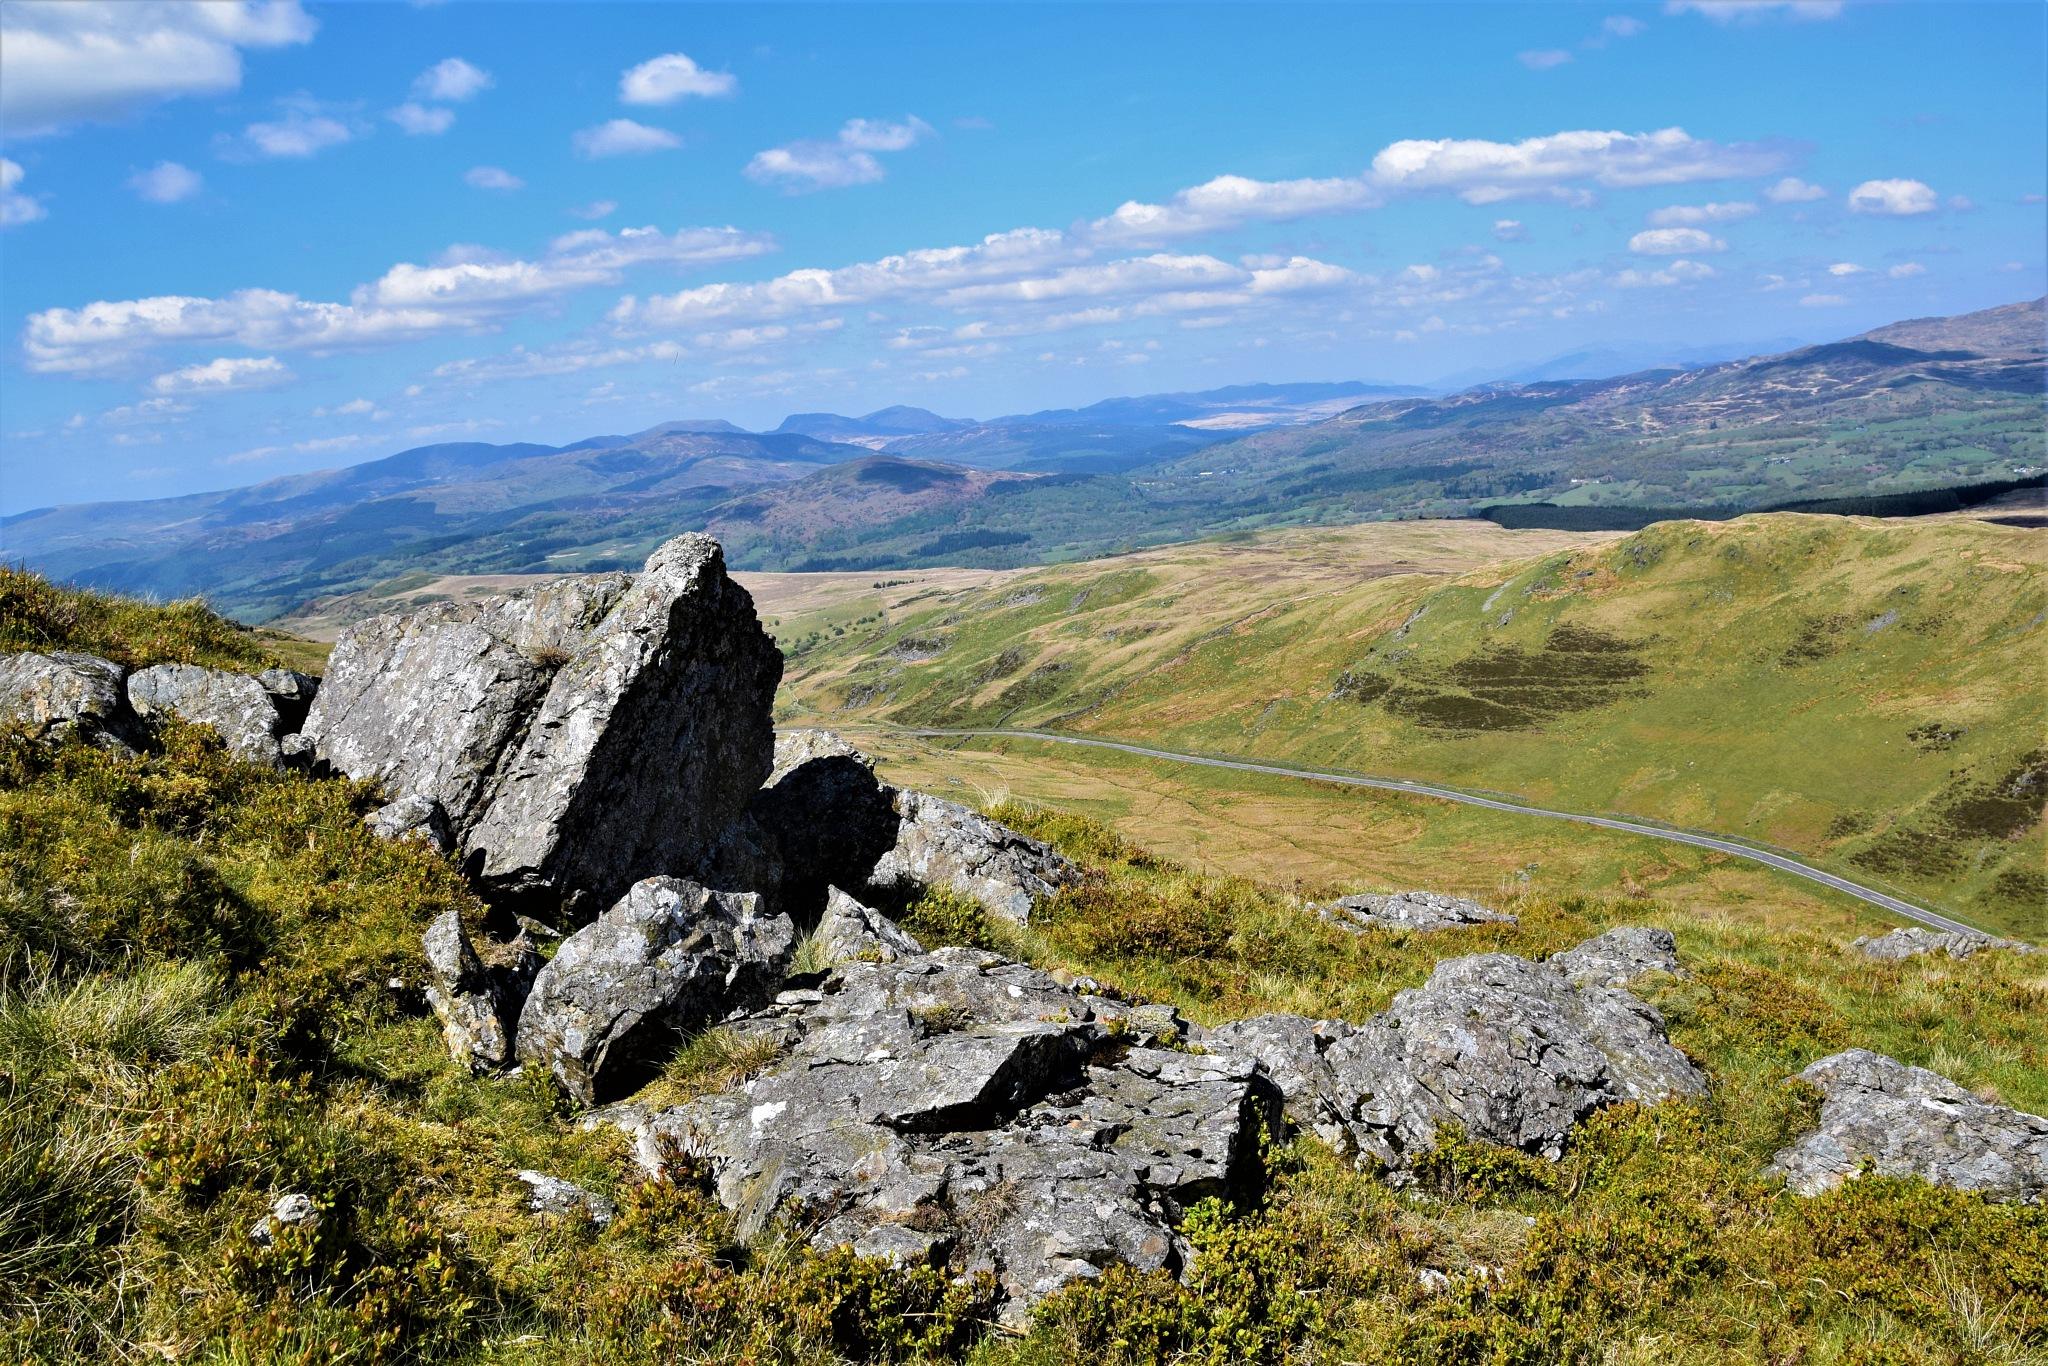 Rocky outcrop by declan delaney